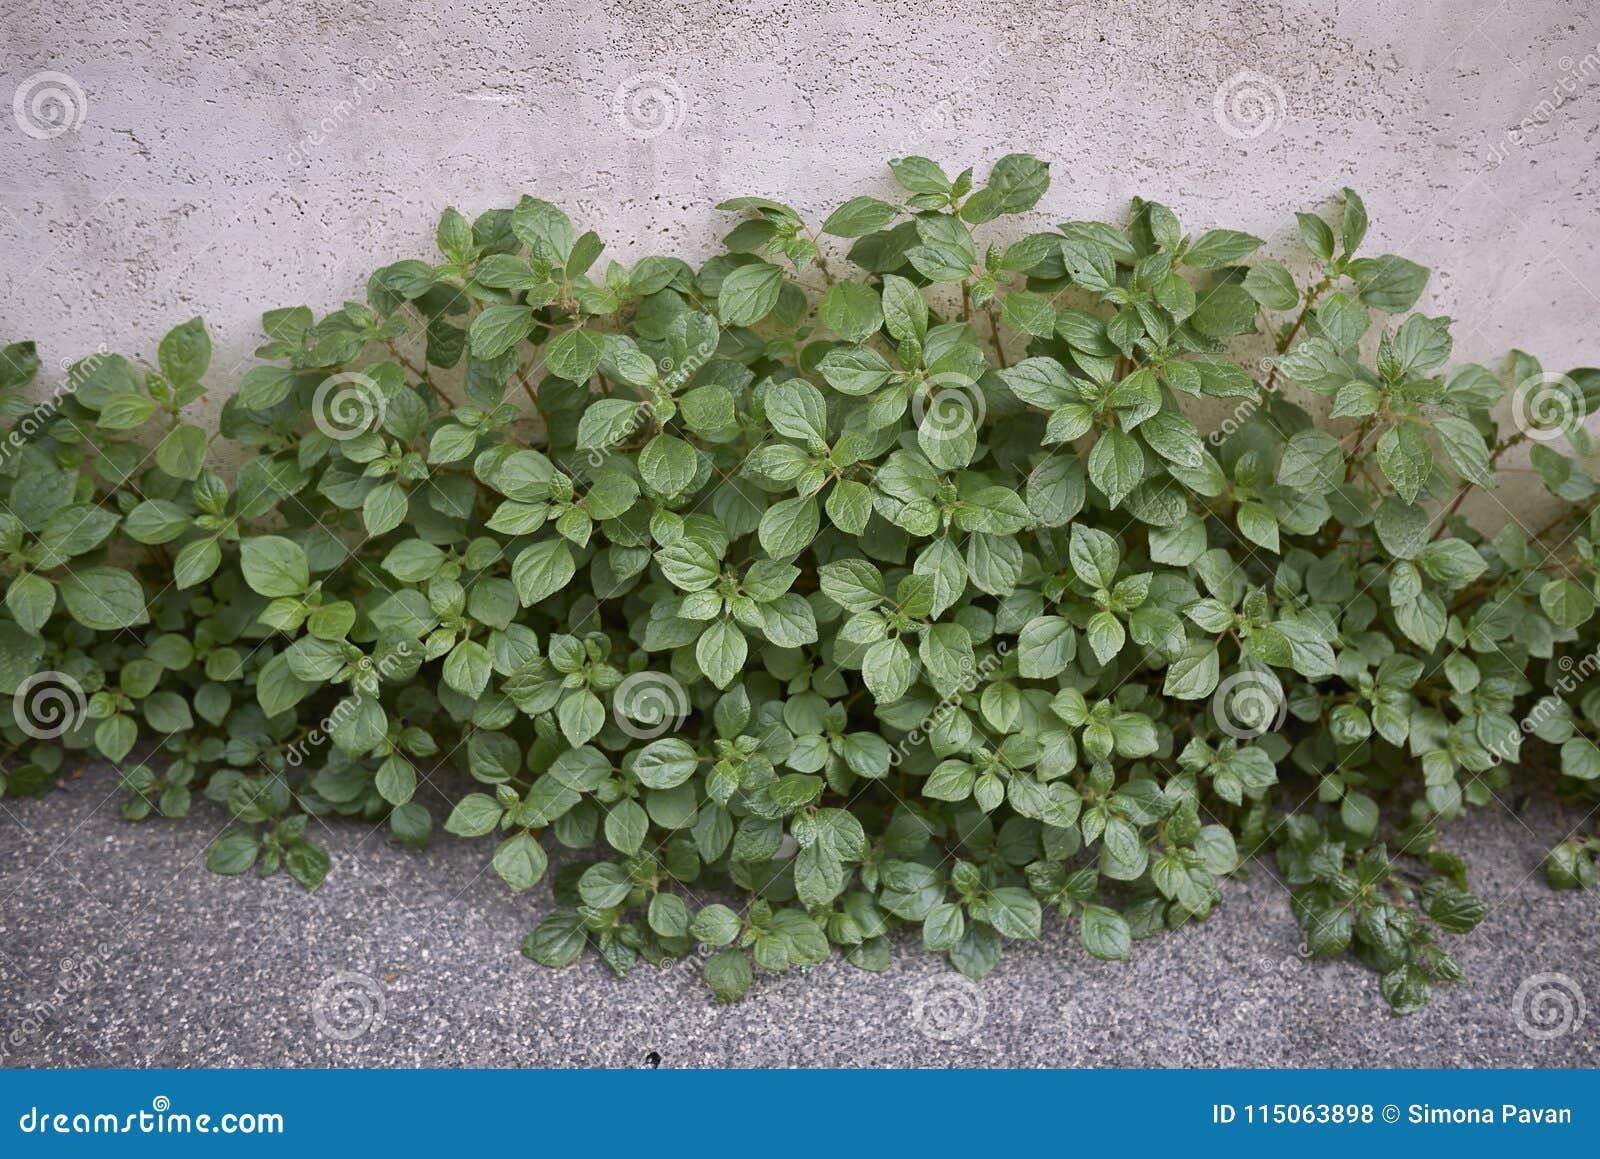 Parietaria Officinalis Plants Stock Photo Image Of Lichwort